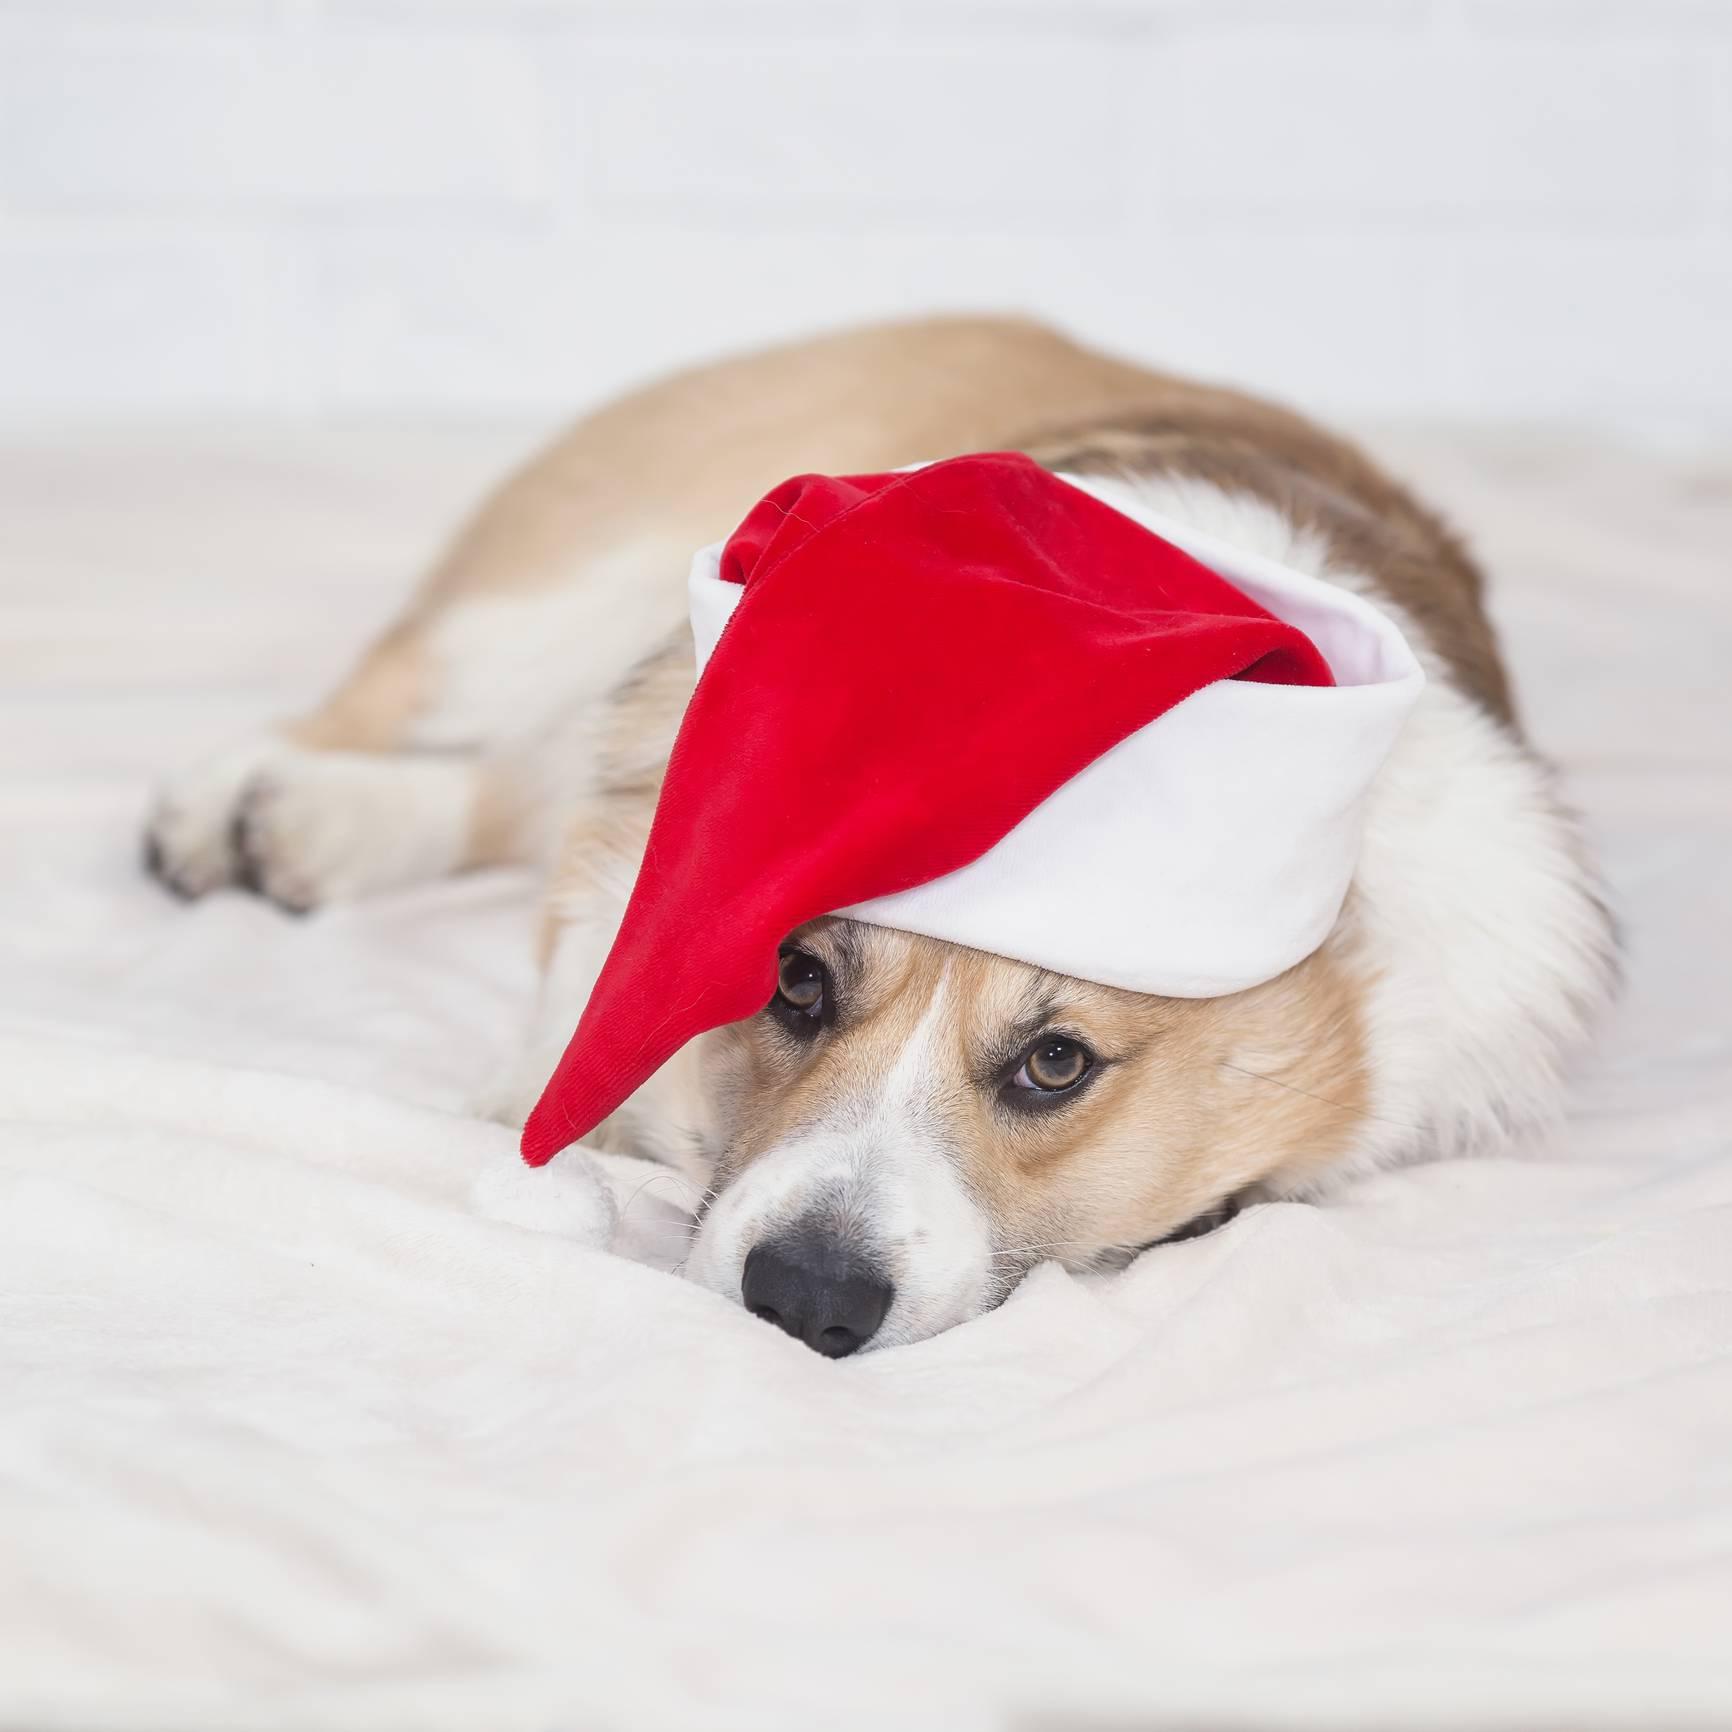 portrait of a little Corgi dog puppy lying on a white fluffy bla